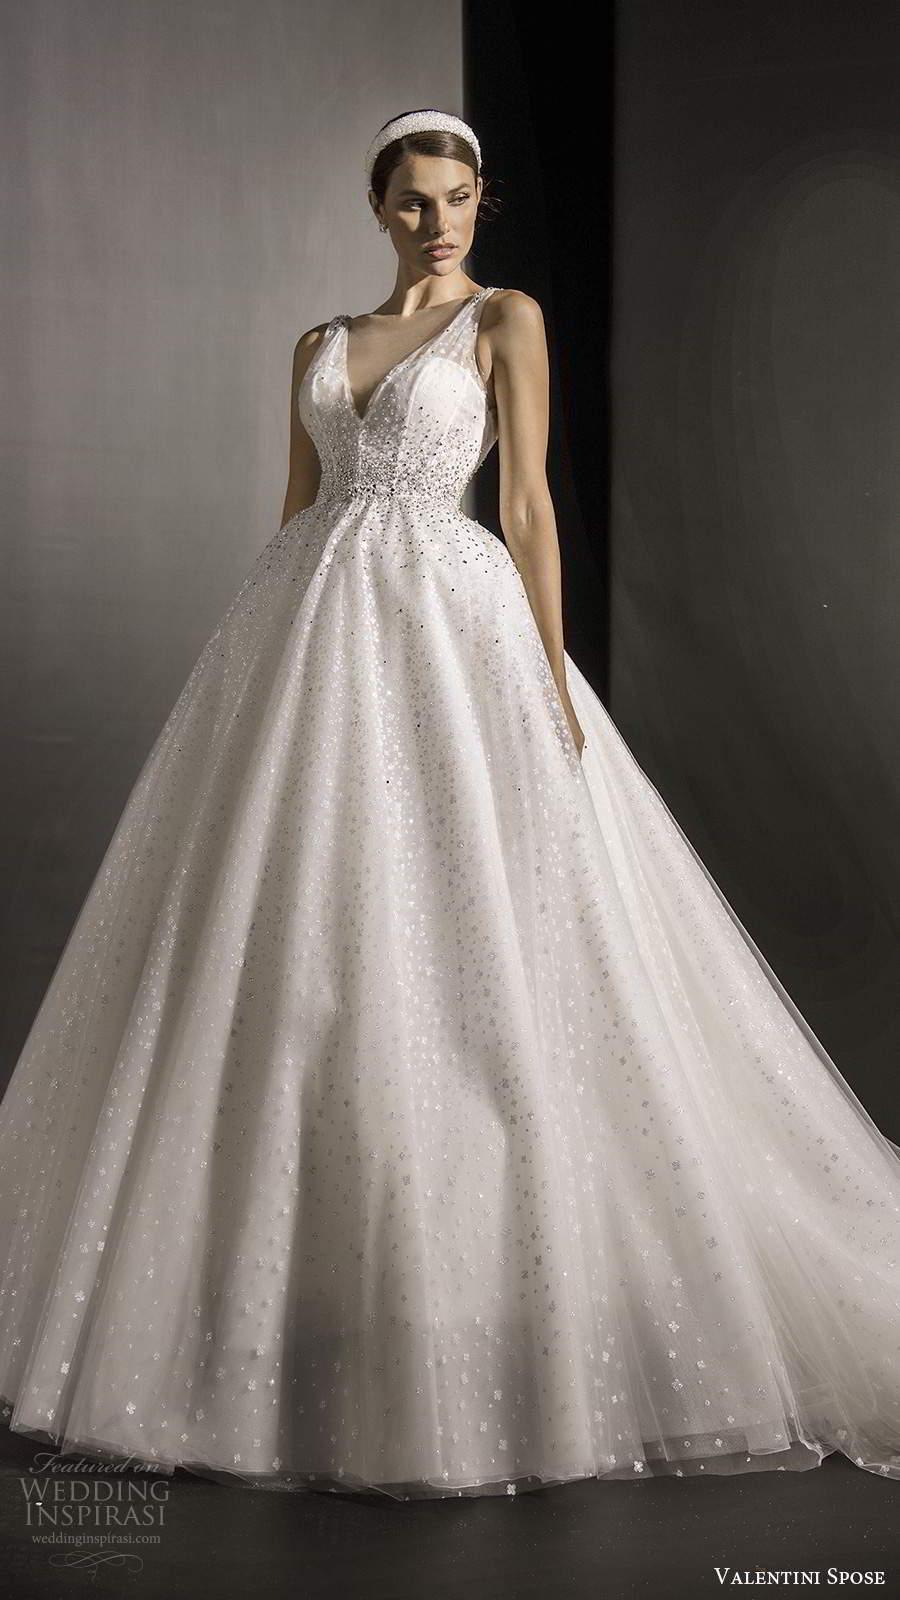 valentini spose fall 2020 bridal sleeveless illusion straps v neckline fully embellished glitzy a line ball gown wedding dress chapel train (1) mv